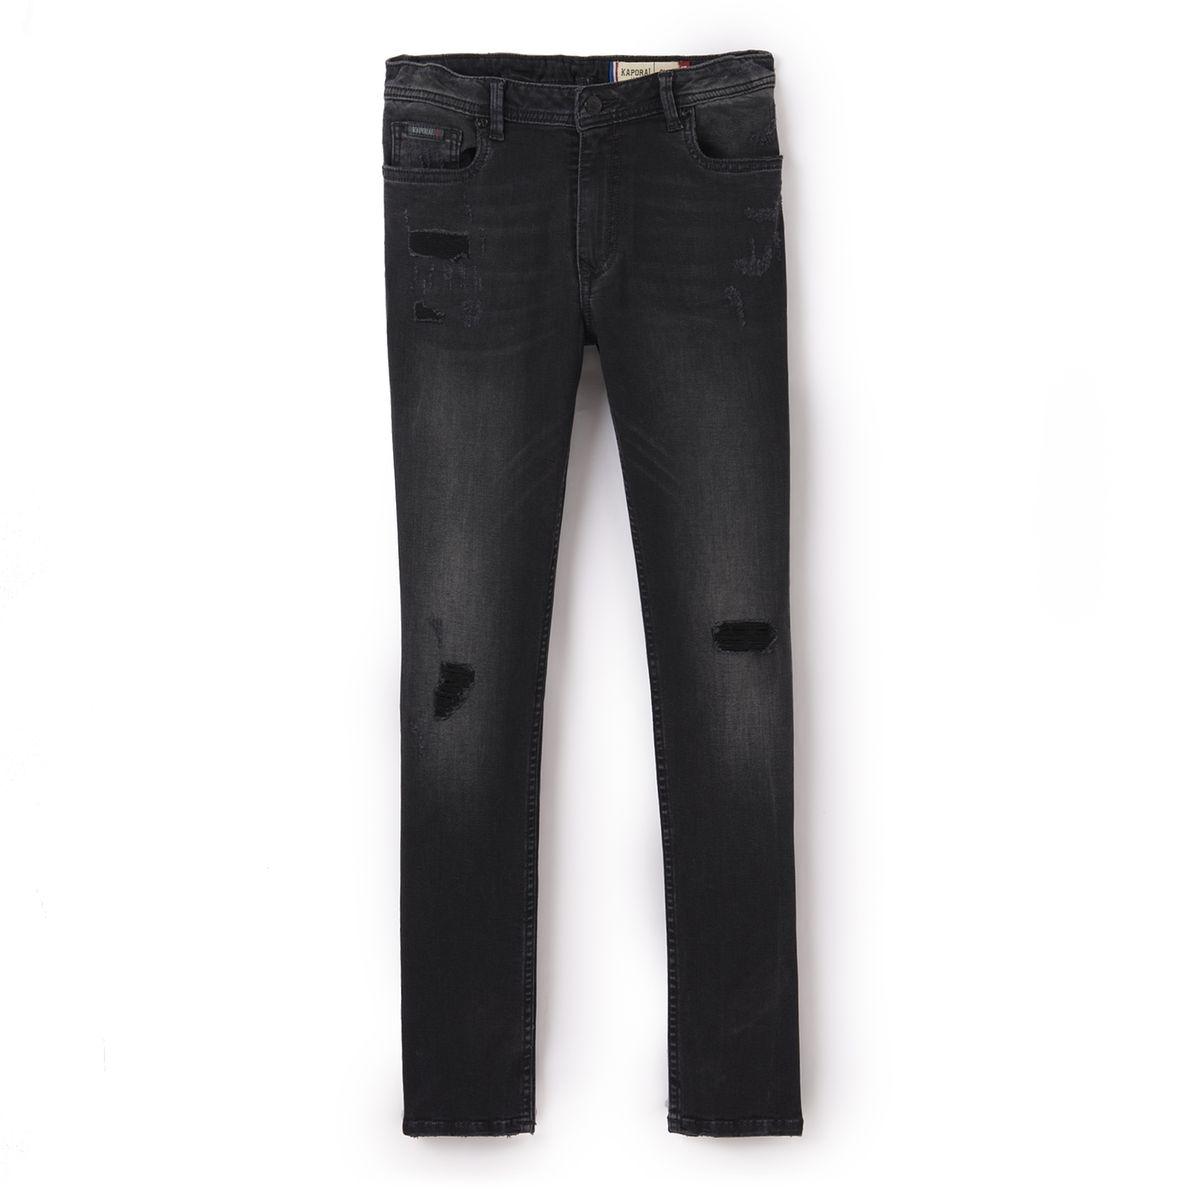 Shopwiki Bleach Kaporal Find It Jovani 5 Jeans At Destroy f6Yb7yg